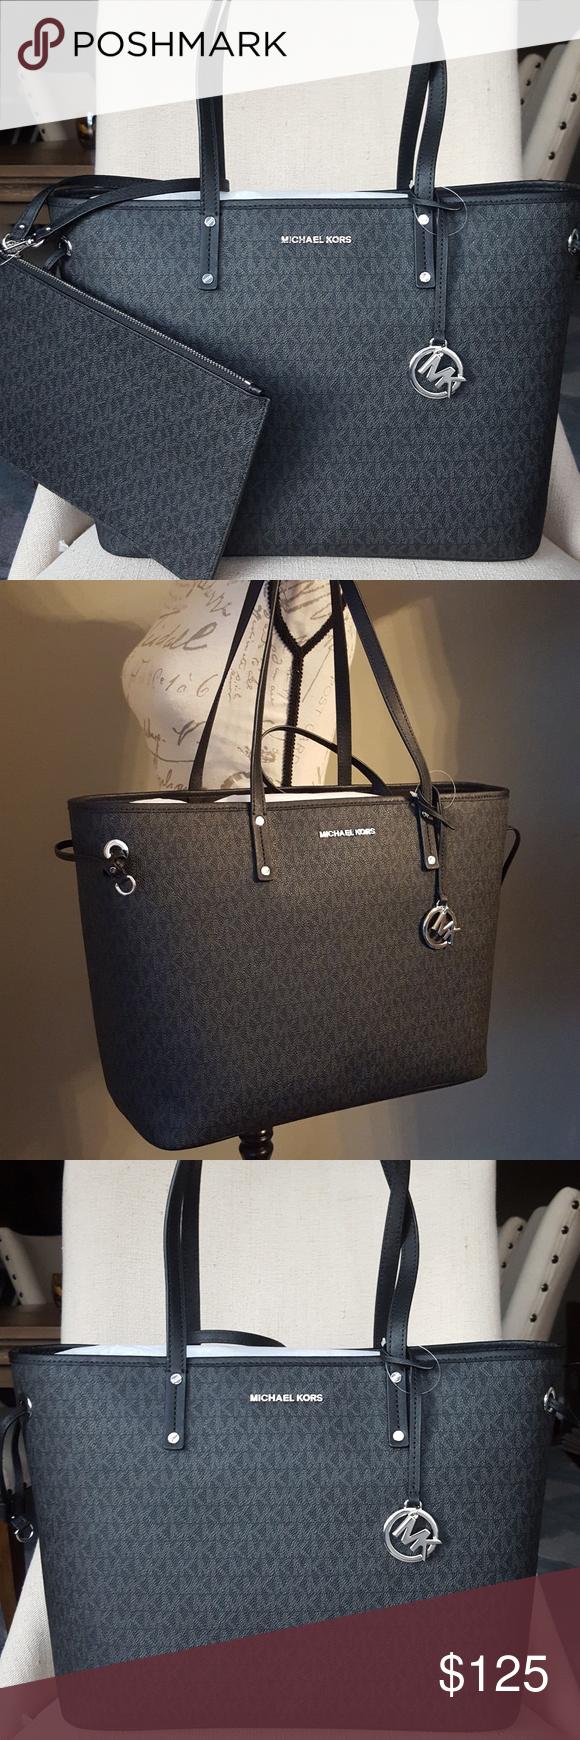 6f5c6762b3fc0 NWT Michael Kors drawstring tote black bag purse 100% guaranteed authentic NWT  Michael Kors large